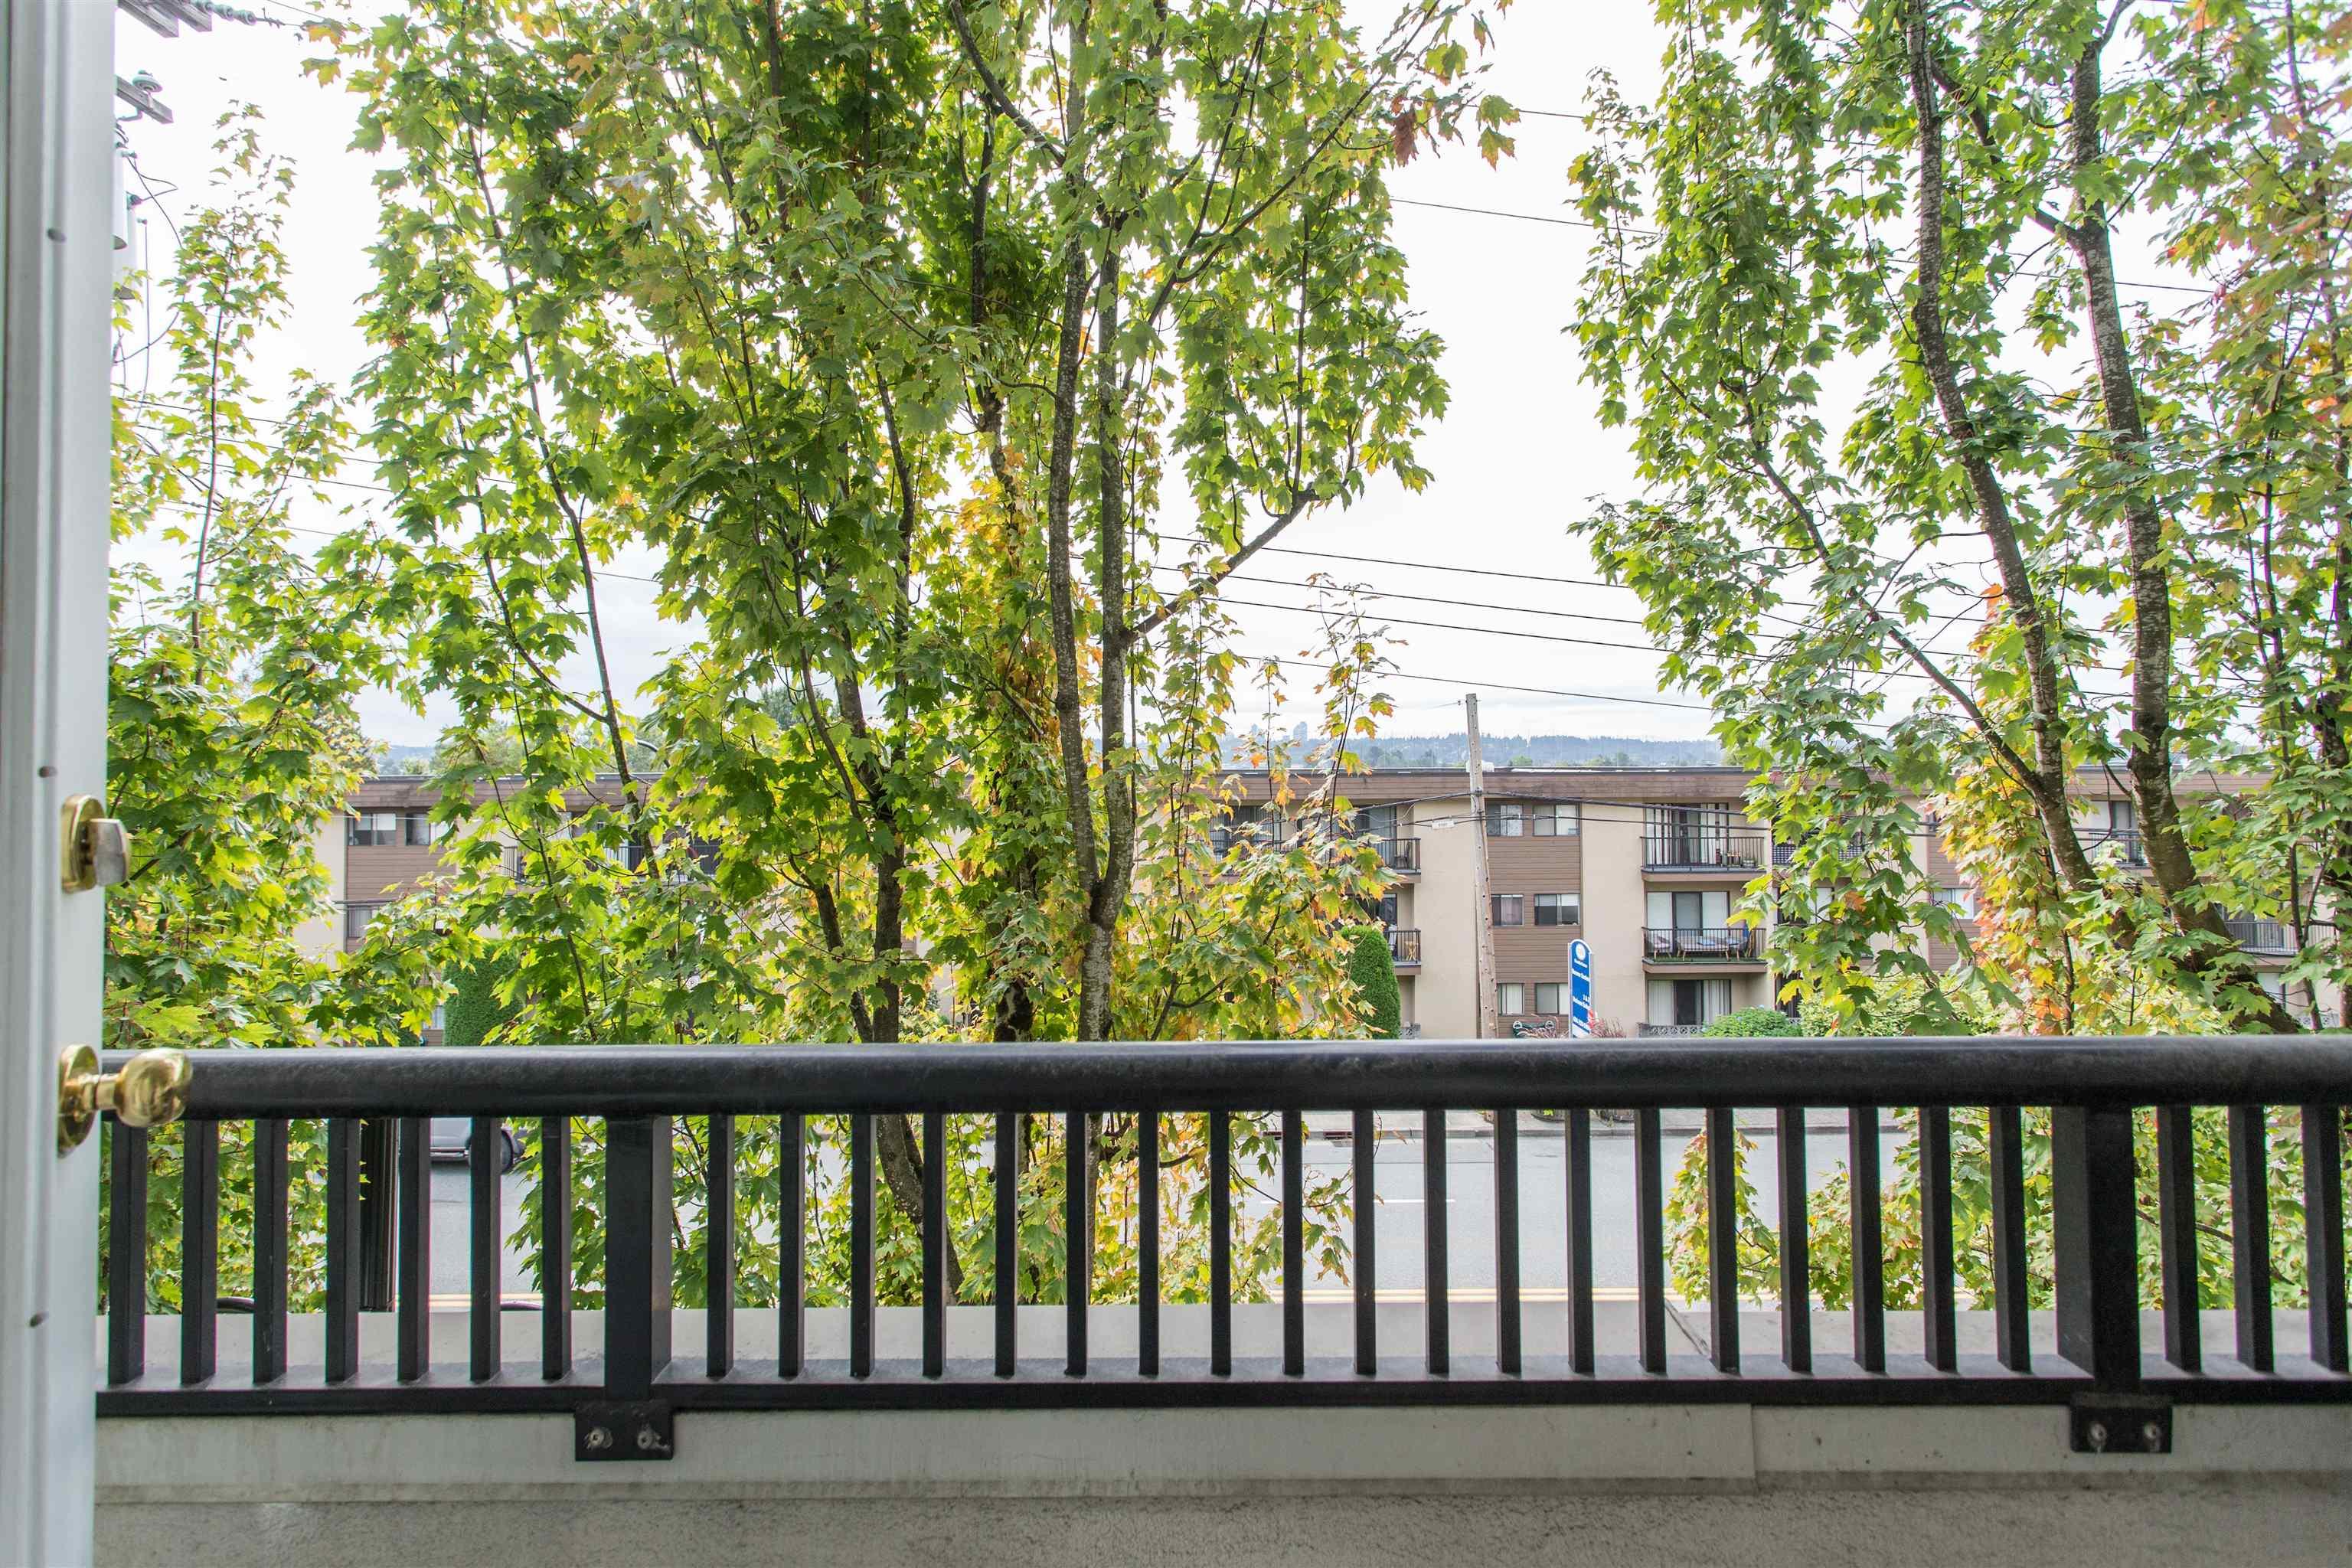 7 205 LEBLEU STREET - Maillardville Apartment/Condo for sale, 3 Bedrooms (R2625671) - #16